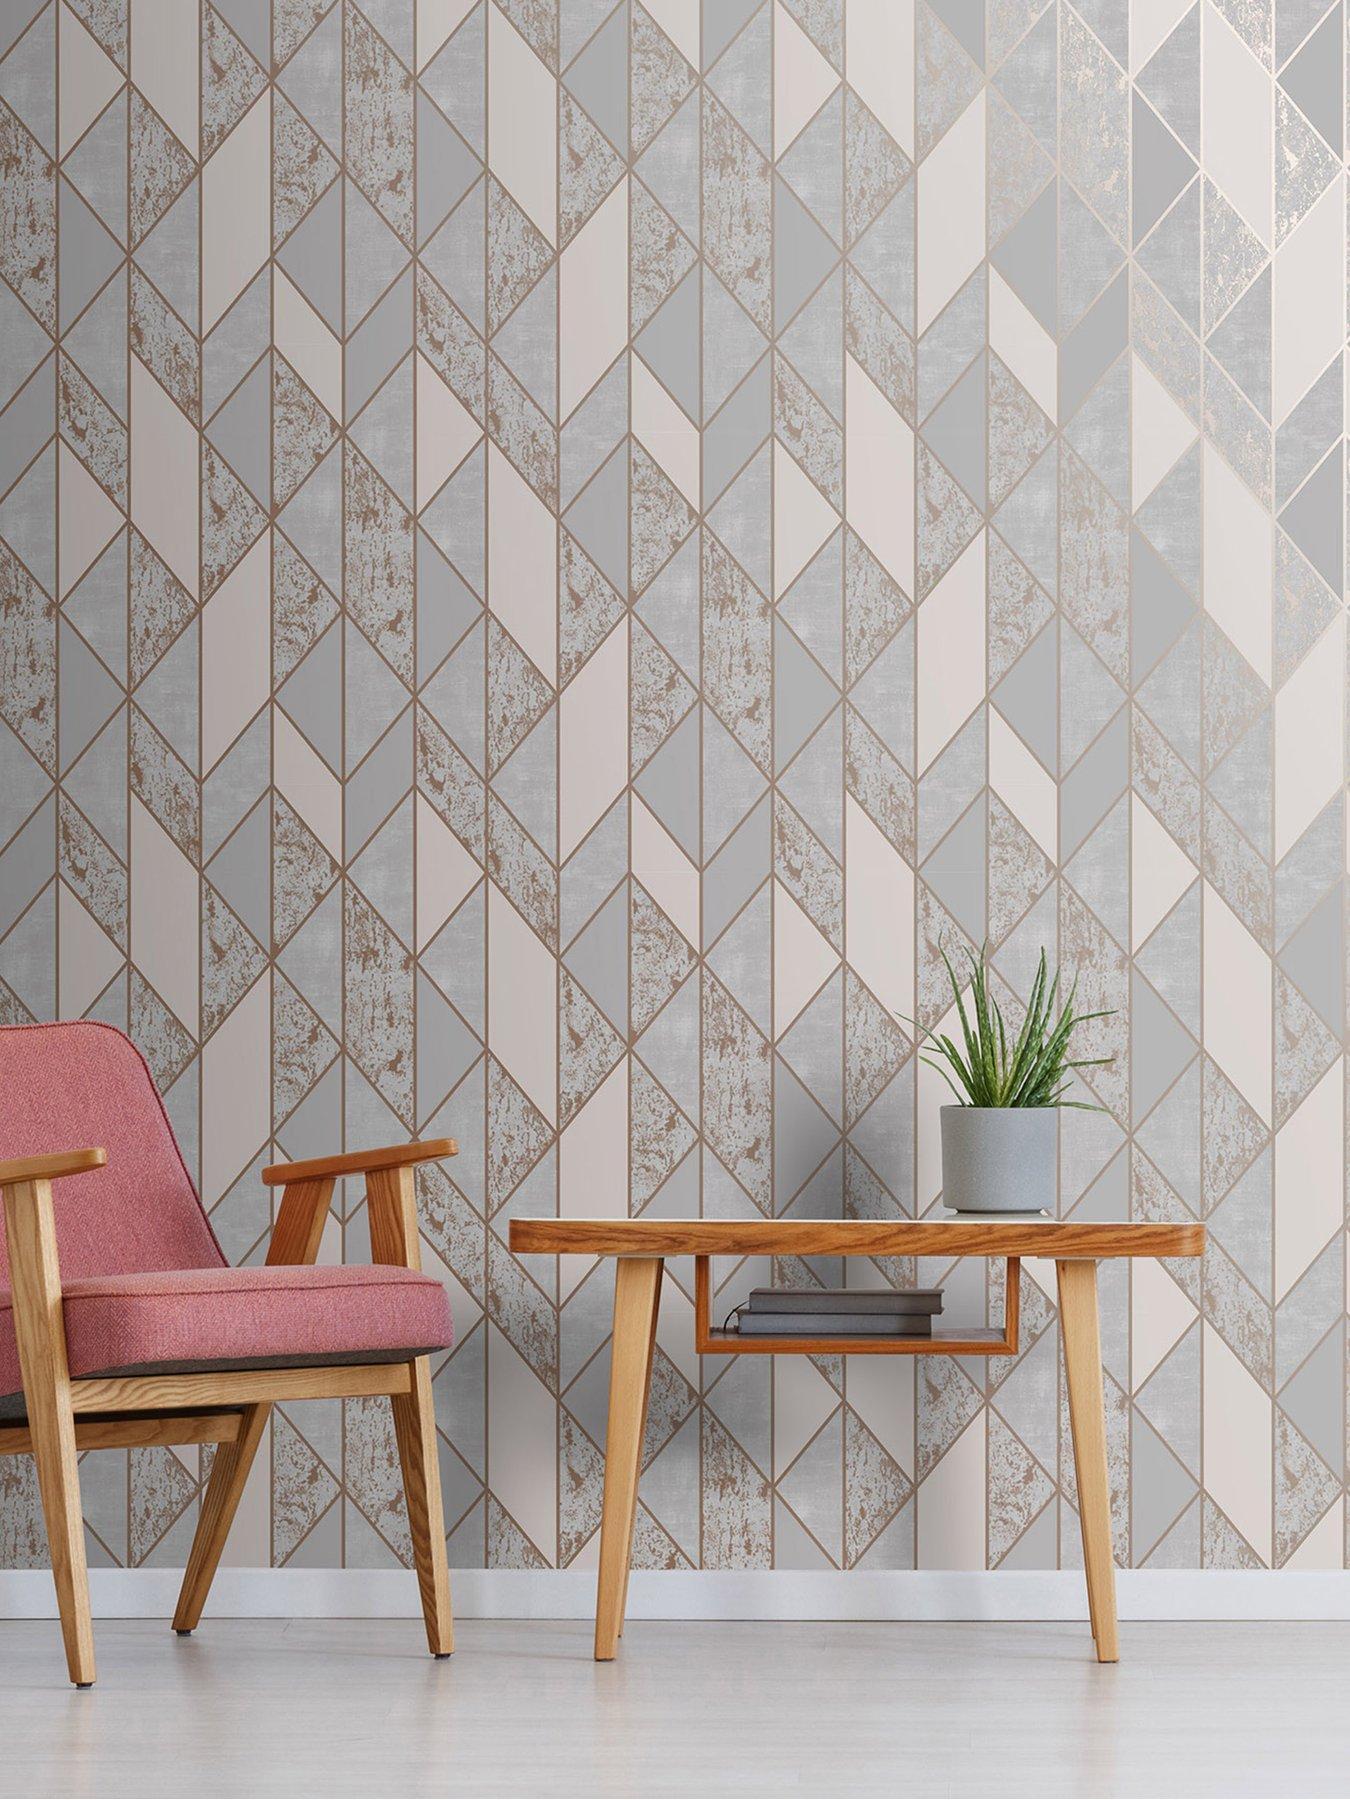 Unduh 740 Koleksi Wallpaper Hp Rose Gold Gratis